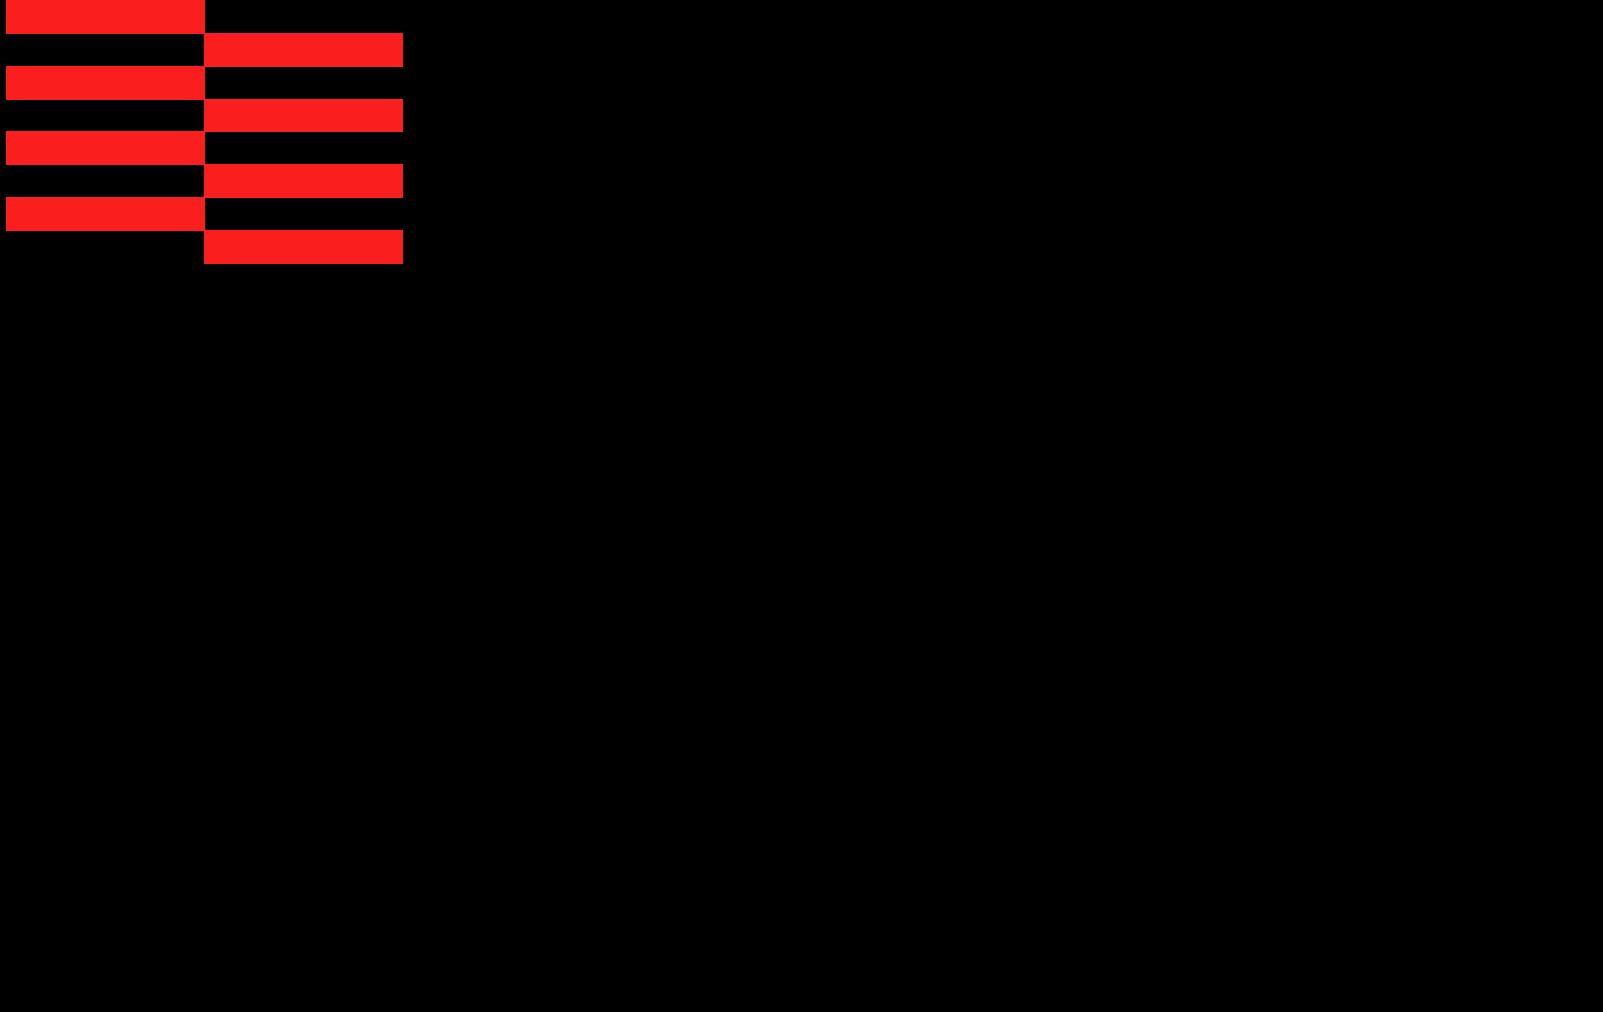 Resultado de imaxes para consell per la republica